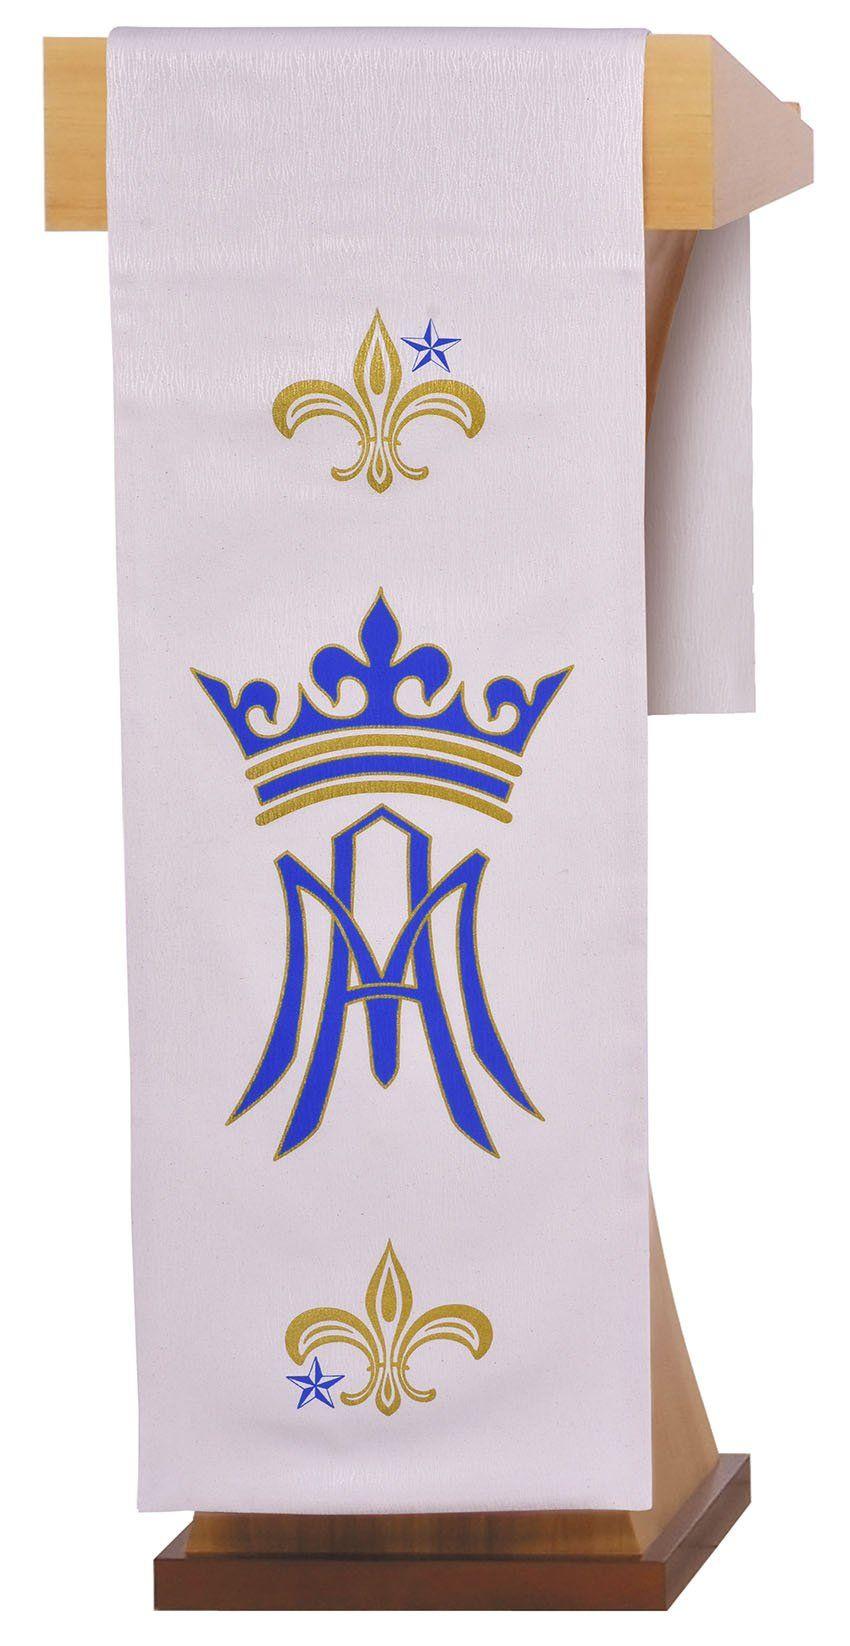 Conjunto Véu de Altar e Estante Santa Maria S204 S205